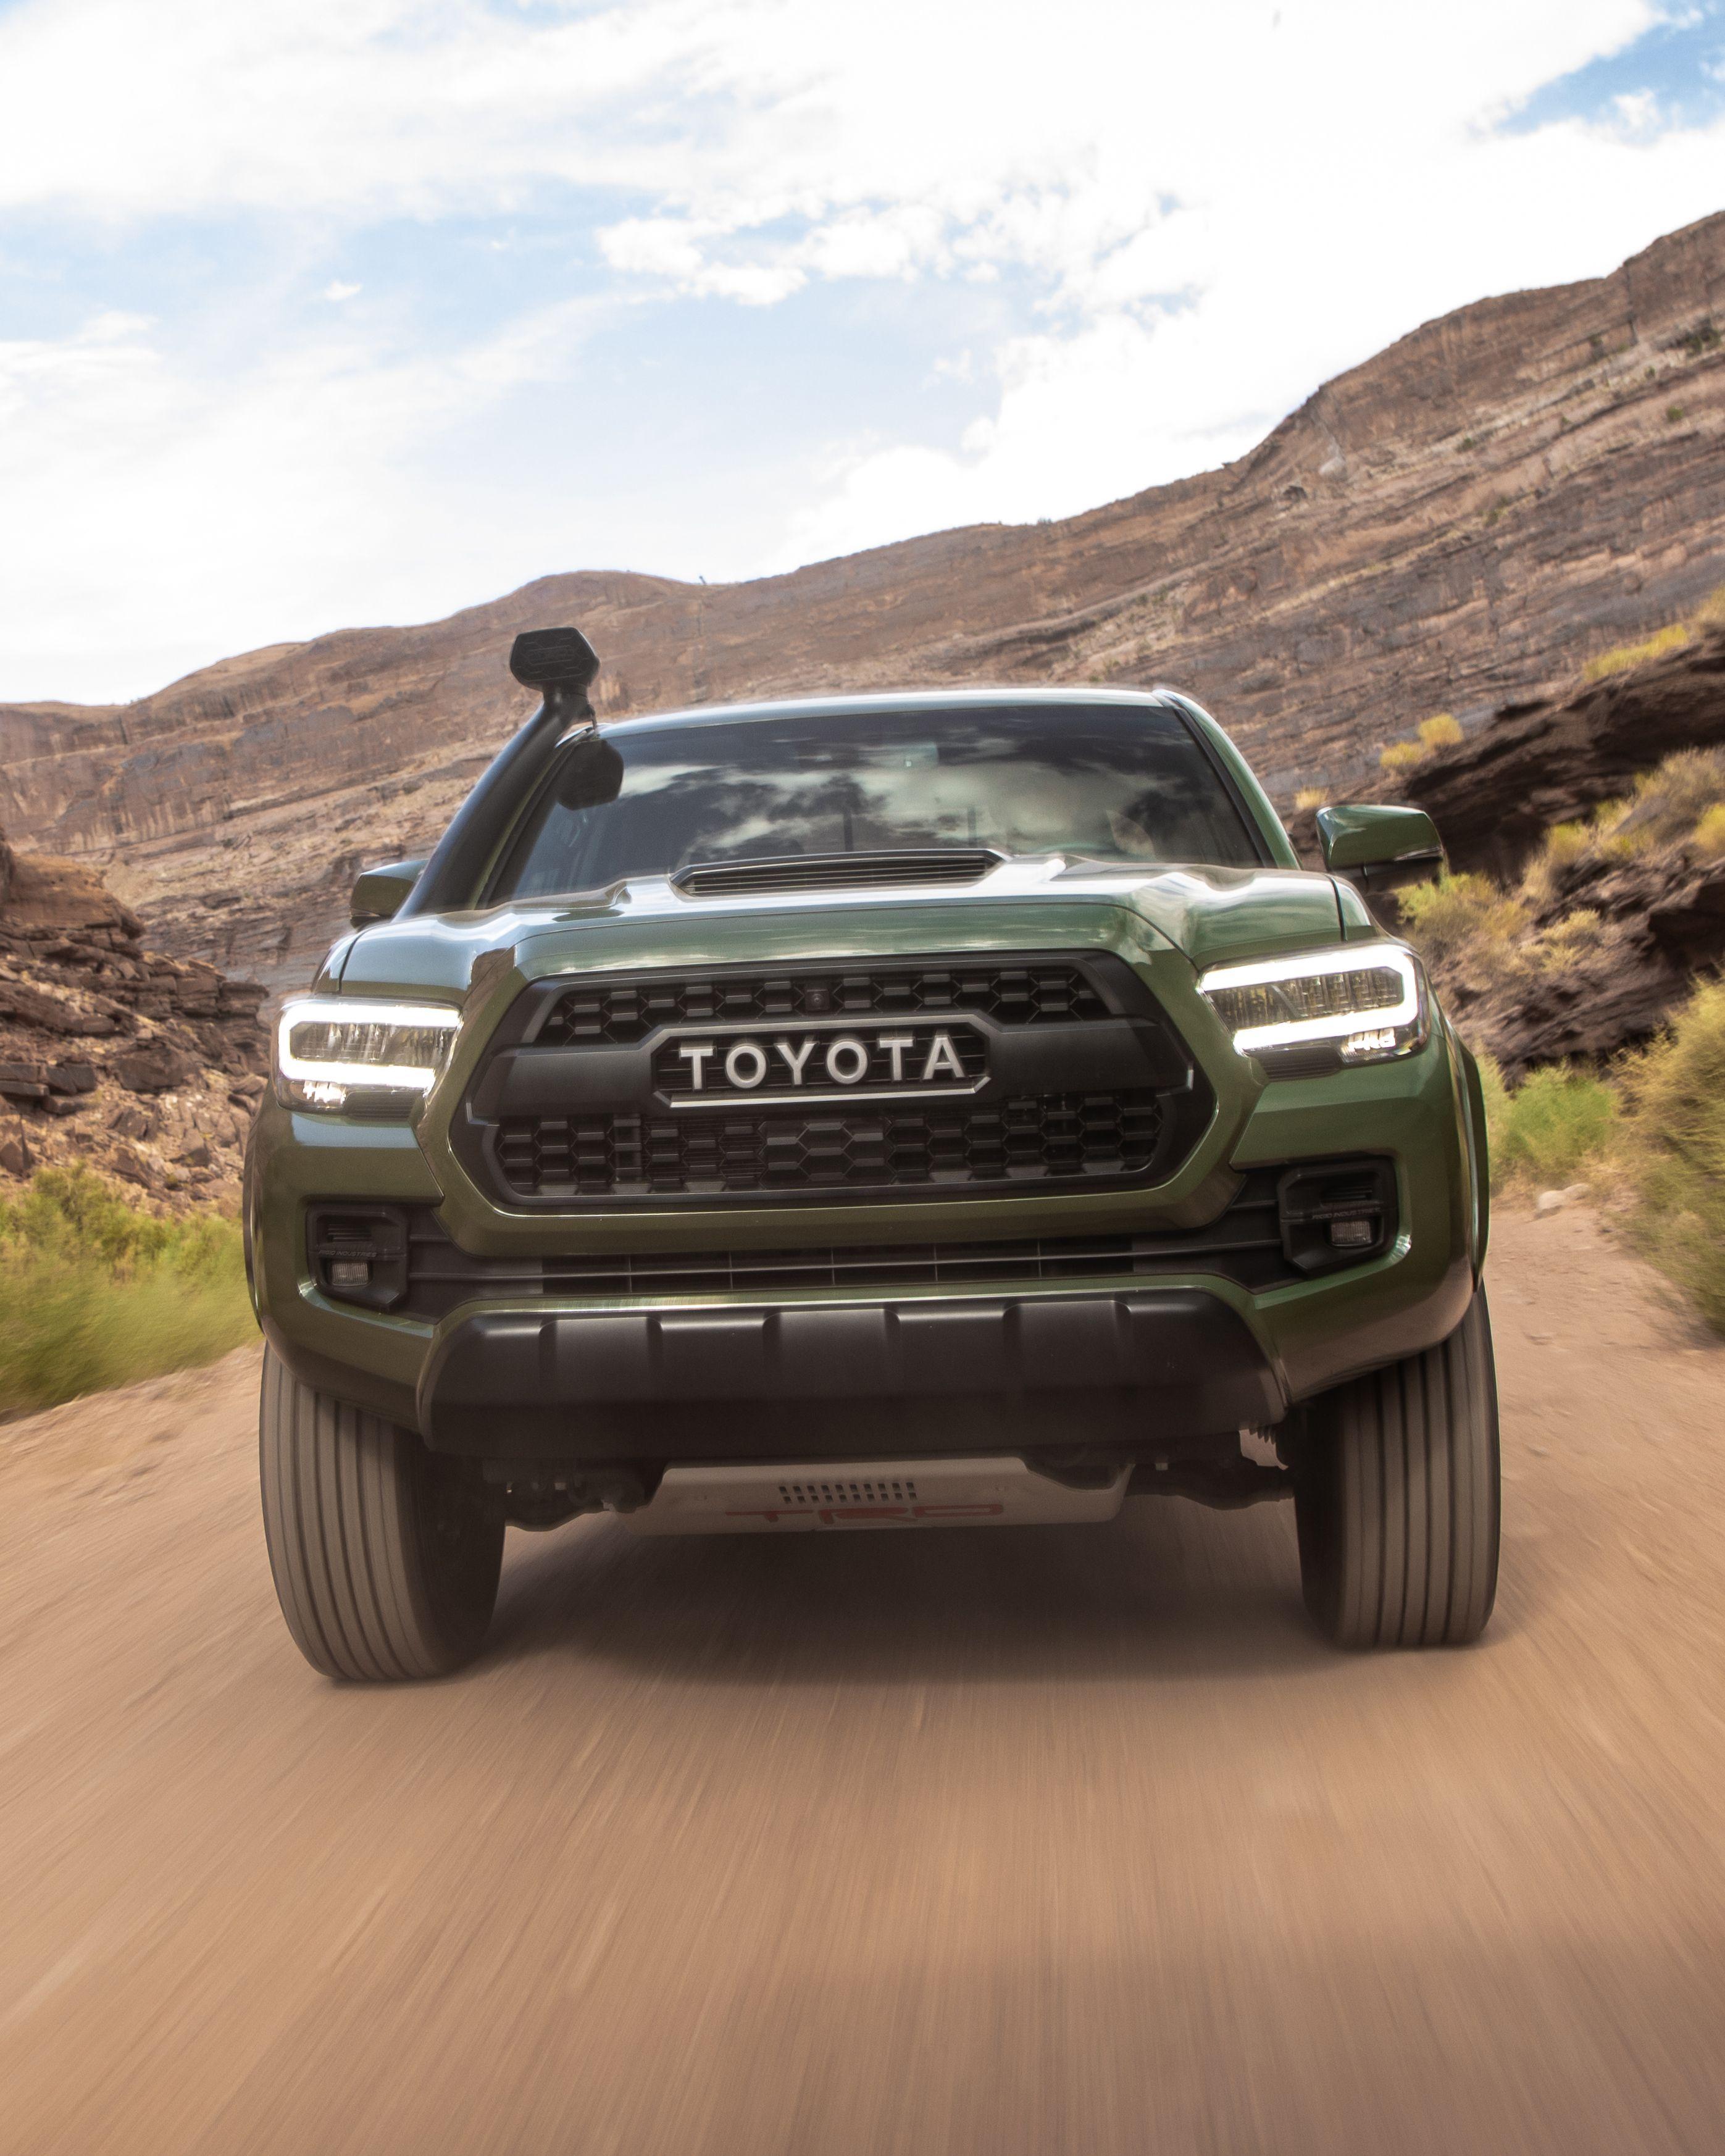 The 2020 Toyota Tacoma Trd Pro Goes Where Few Trucks Can Toyota Tacoma Trd Pro Tacoma Trd Toyota Tacoma Trd